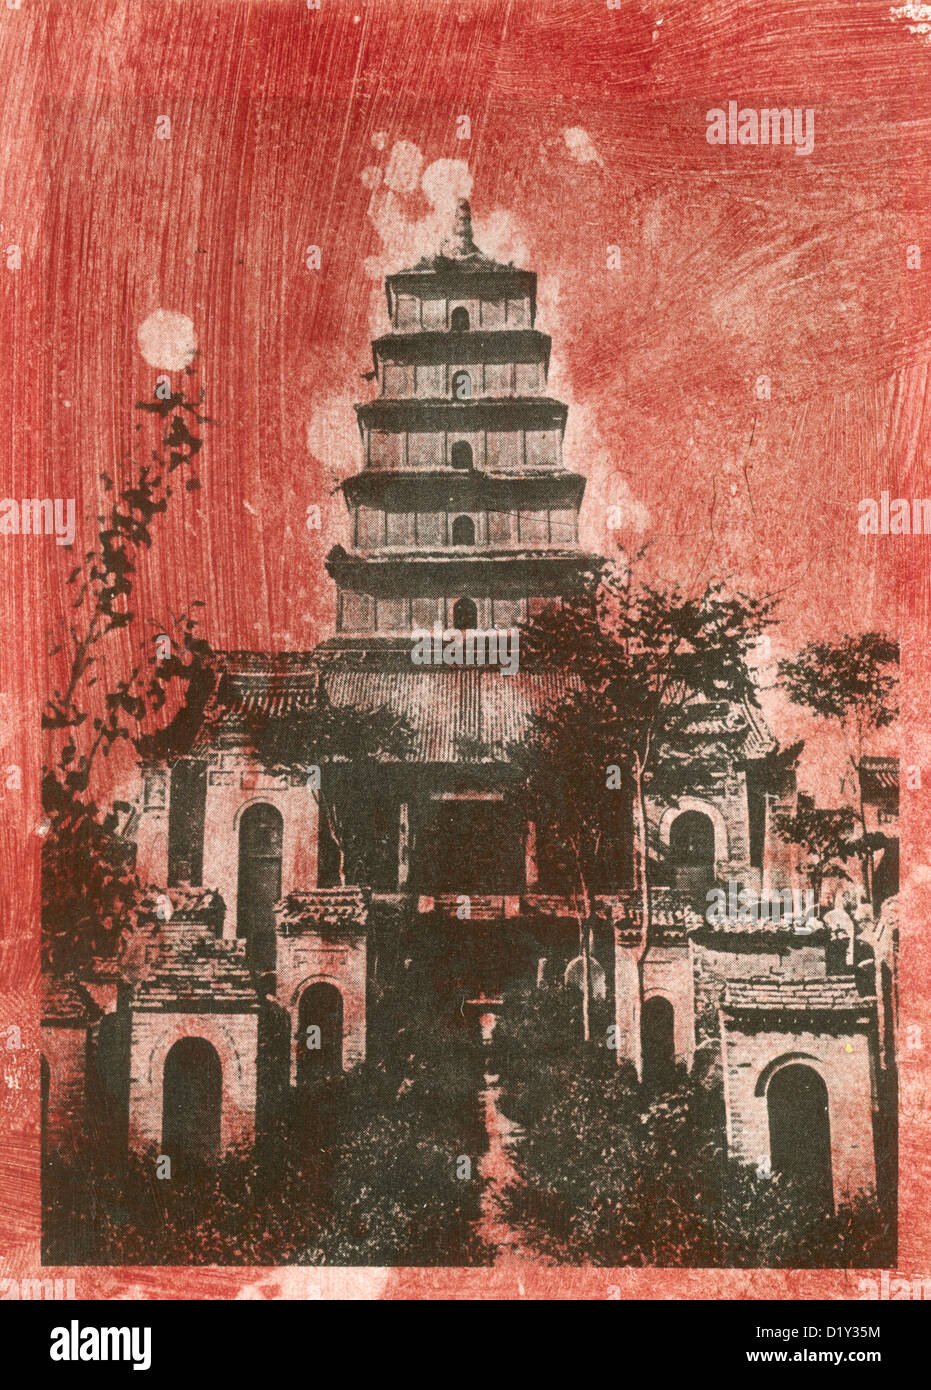 Tradizionale Pagoda giapponese colorate mixed media stampa. Immagini Stock